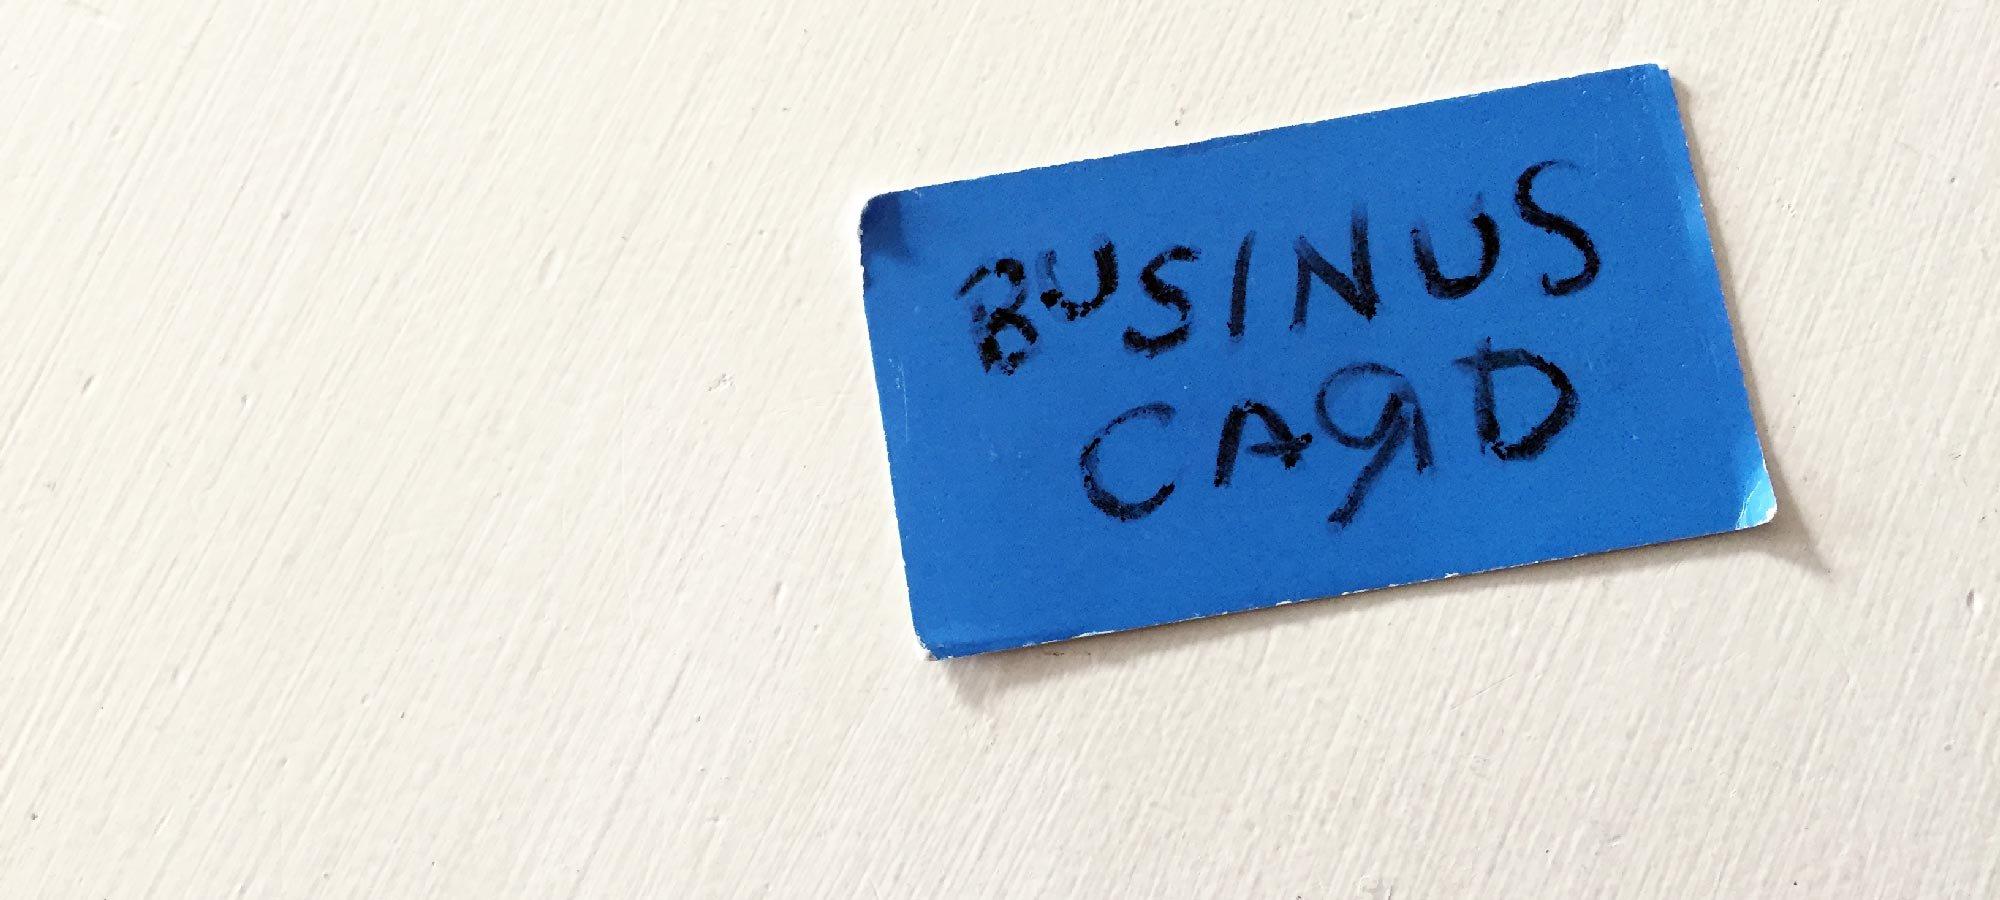 business-card-design-tips-hero